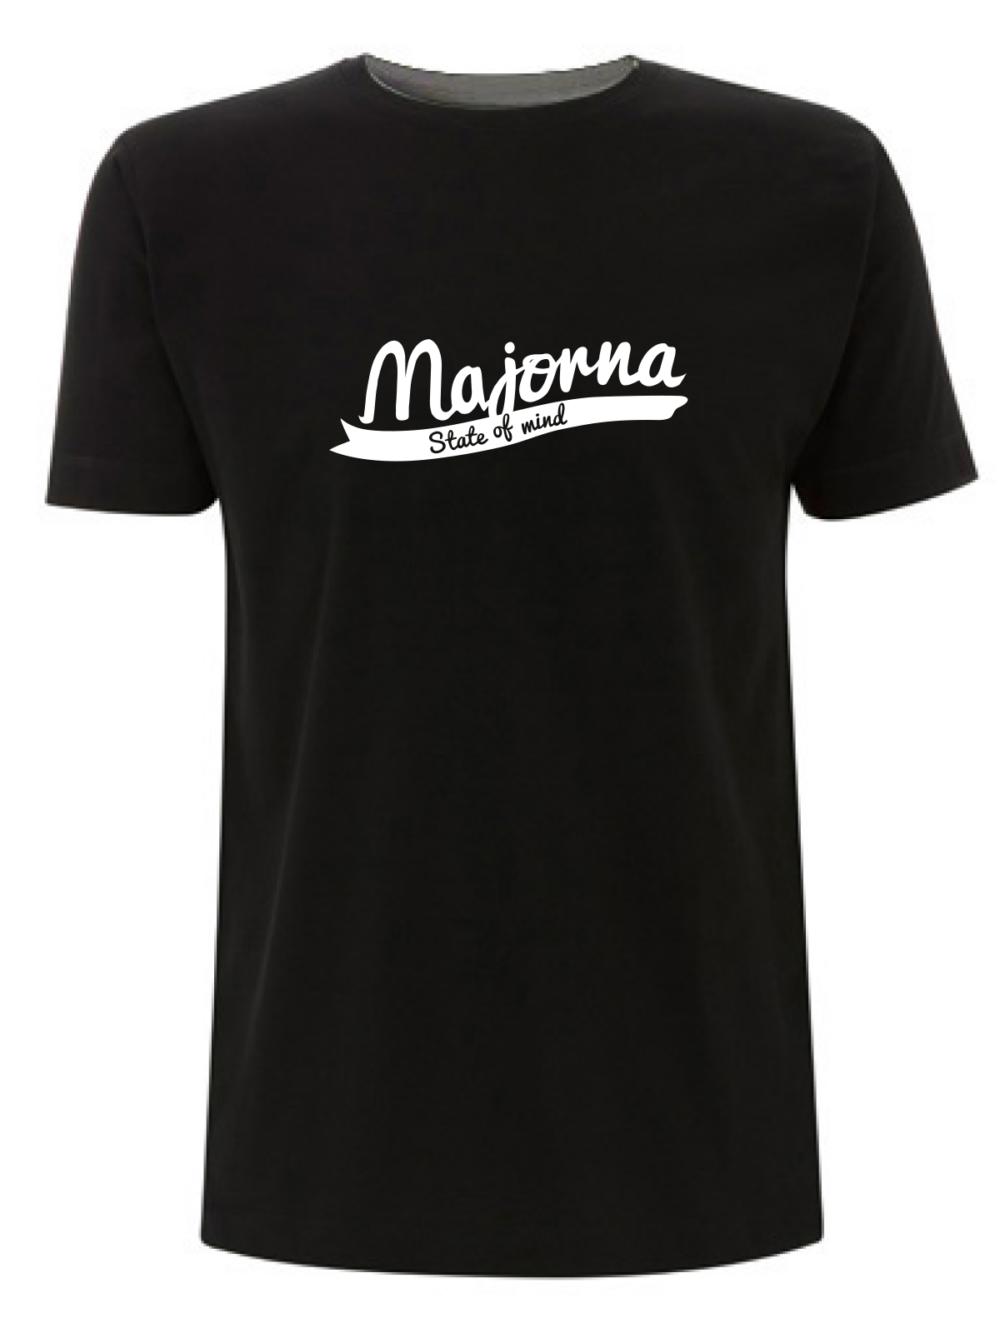 Majorna state of mind T-shirt